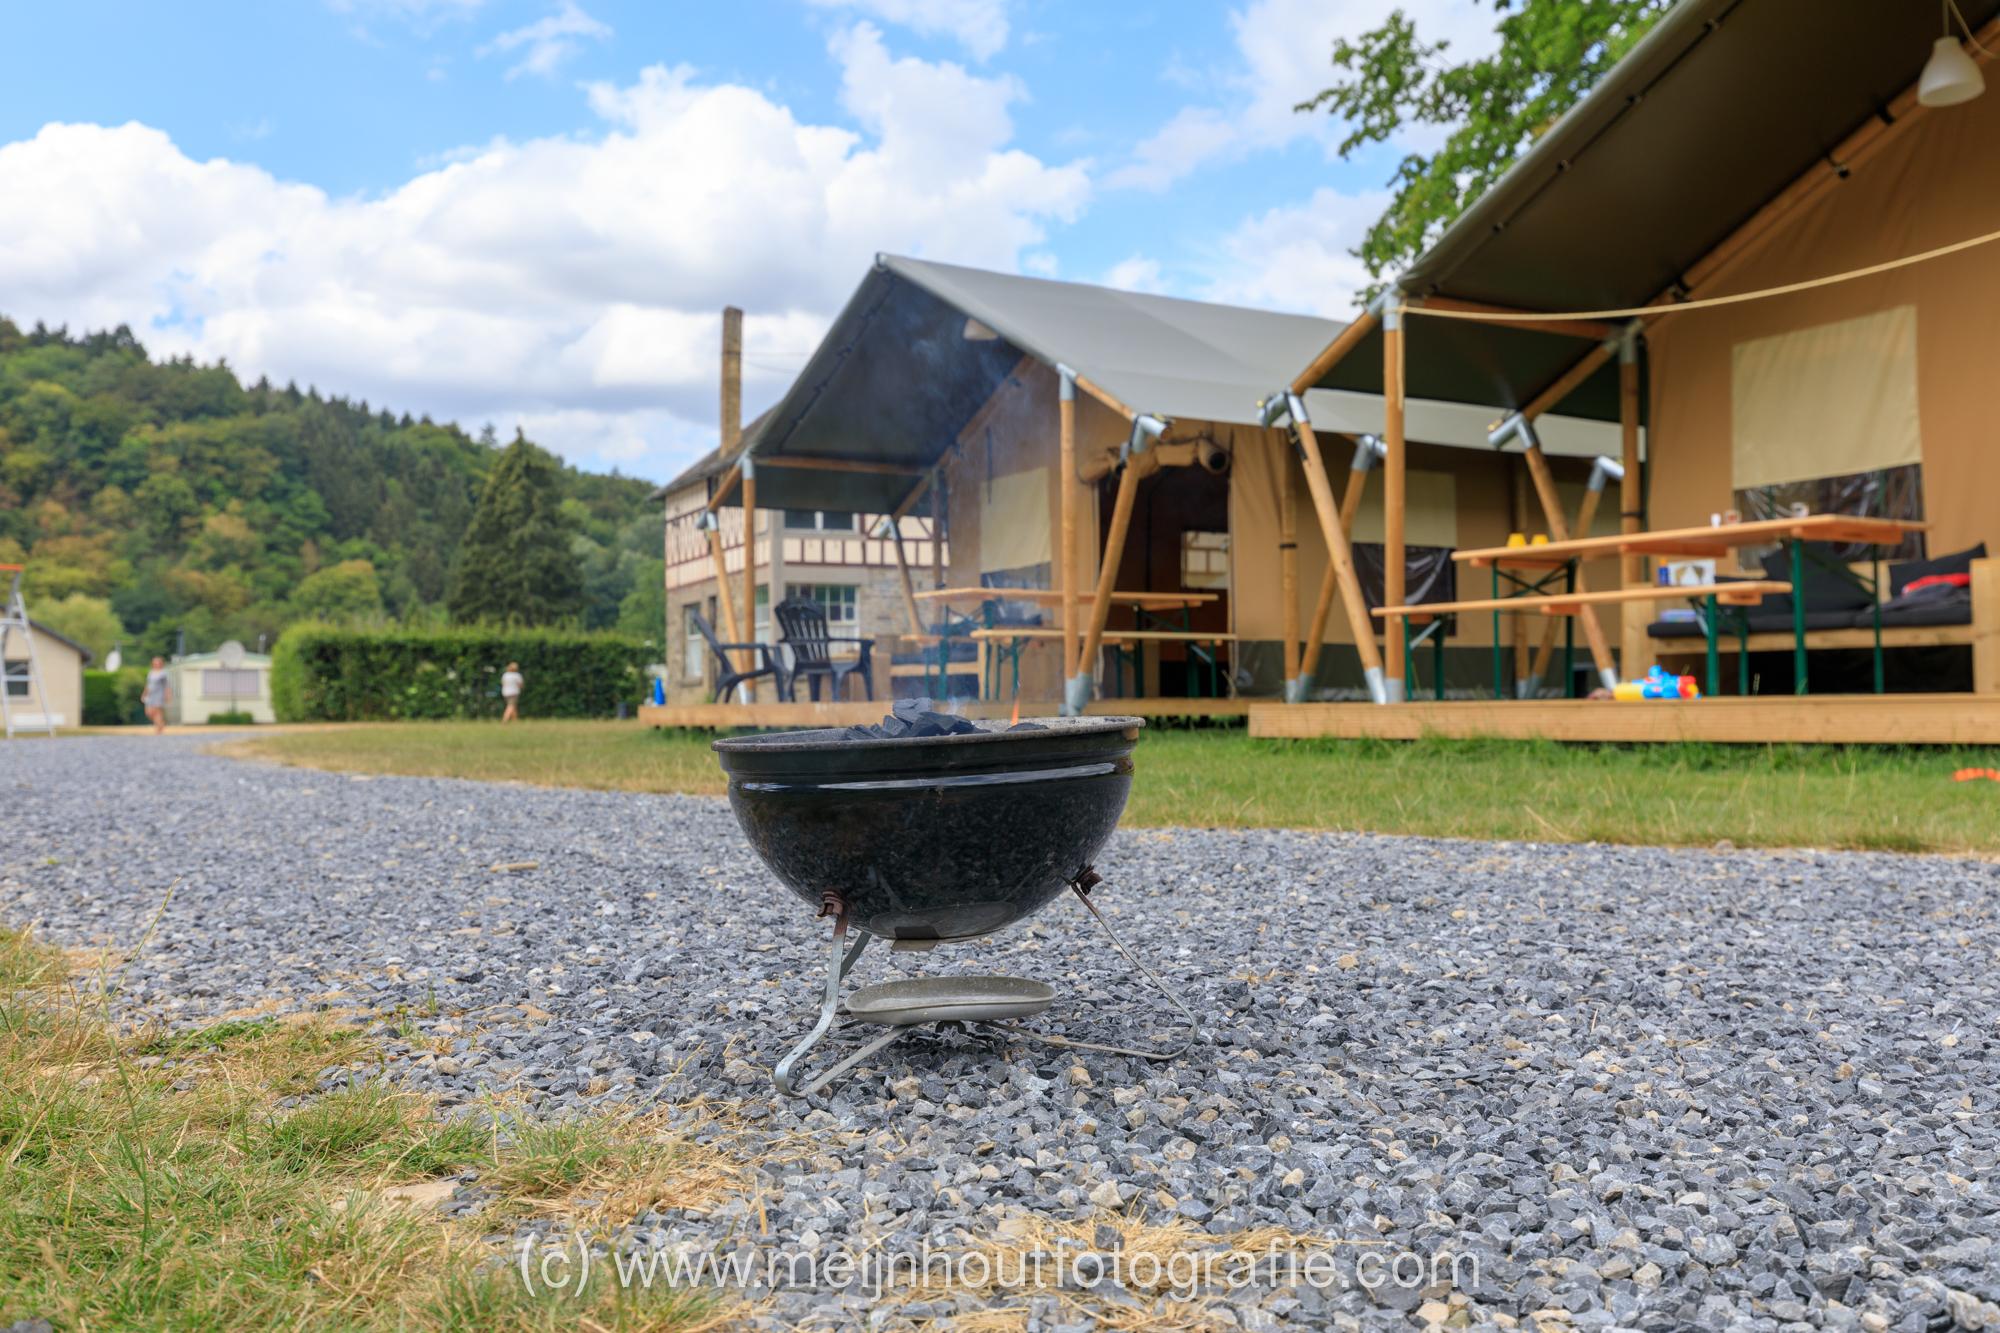 20180728-IMG_9416 Camping Sy Ardennen Belgium.jpg